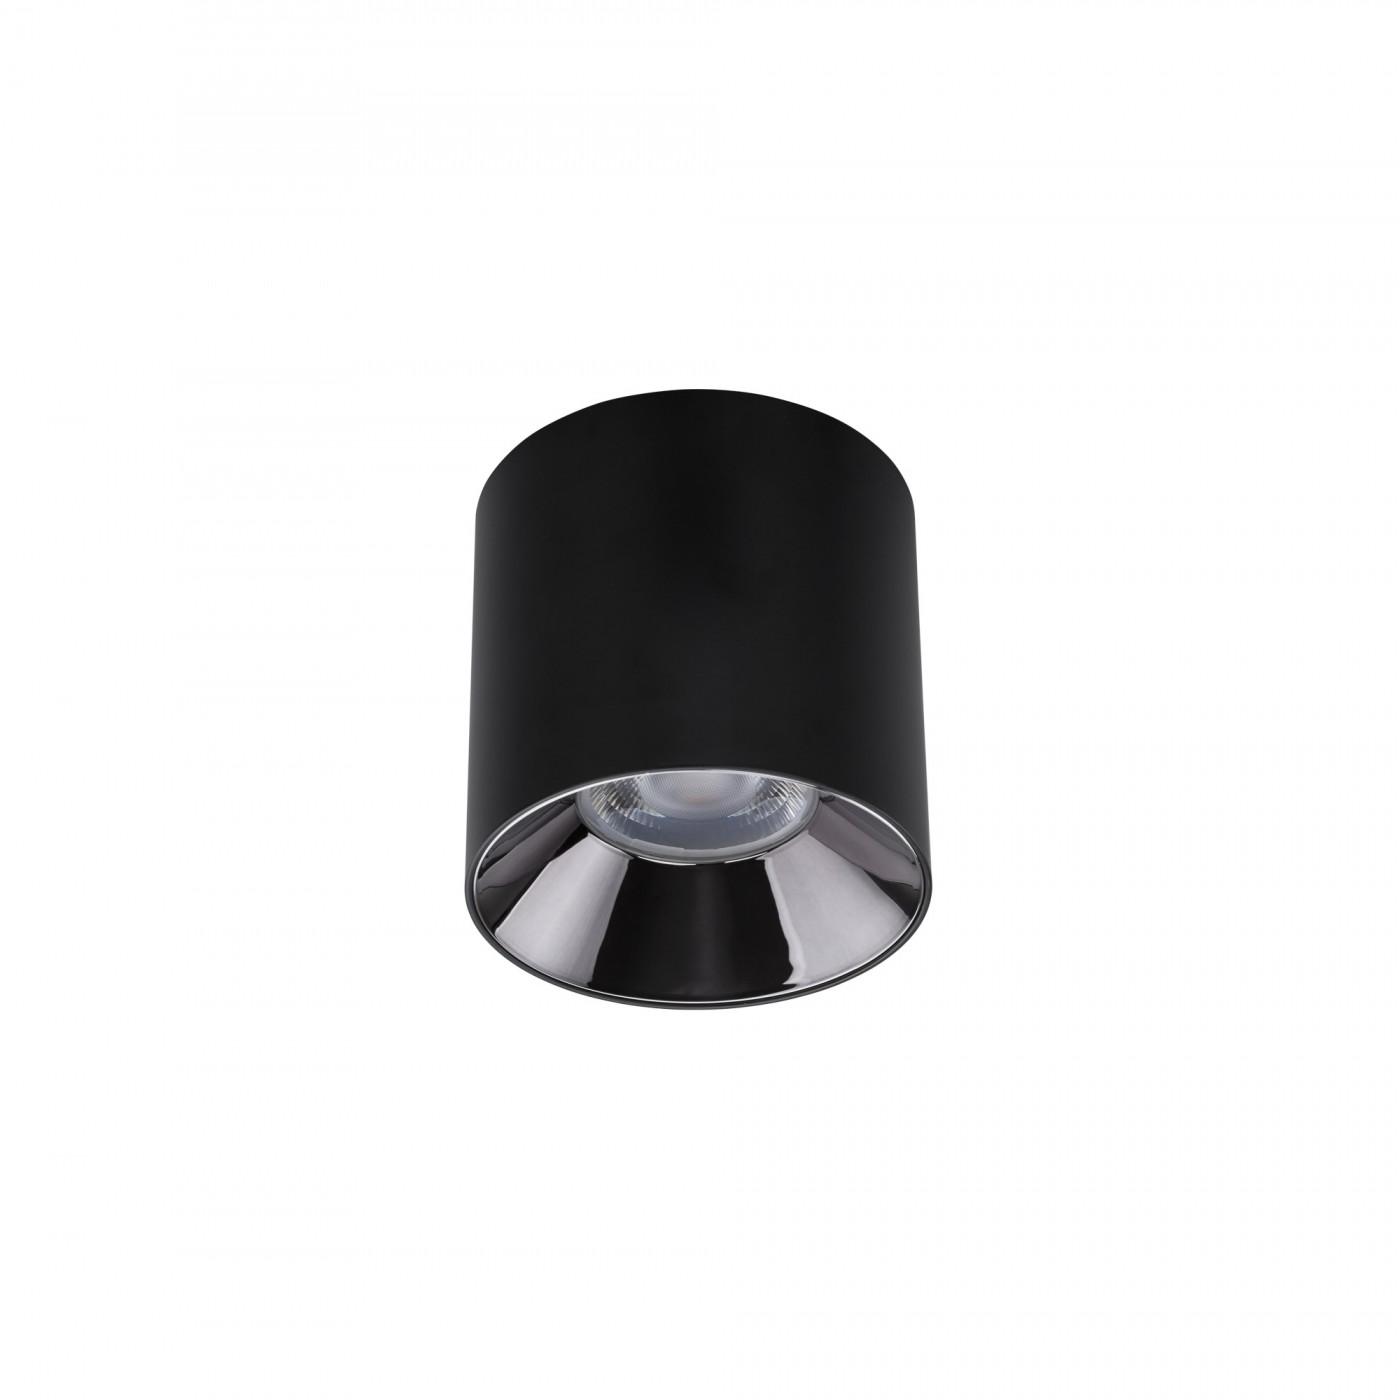 CL IOS LED 30W 4000K black 8732 Nowodvorski Lighting